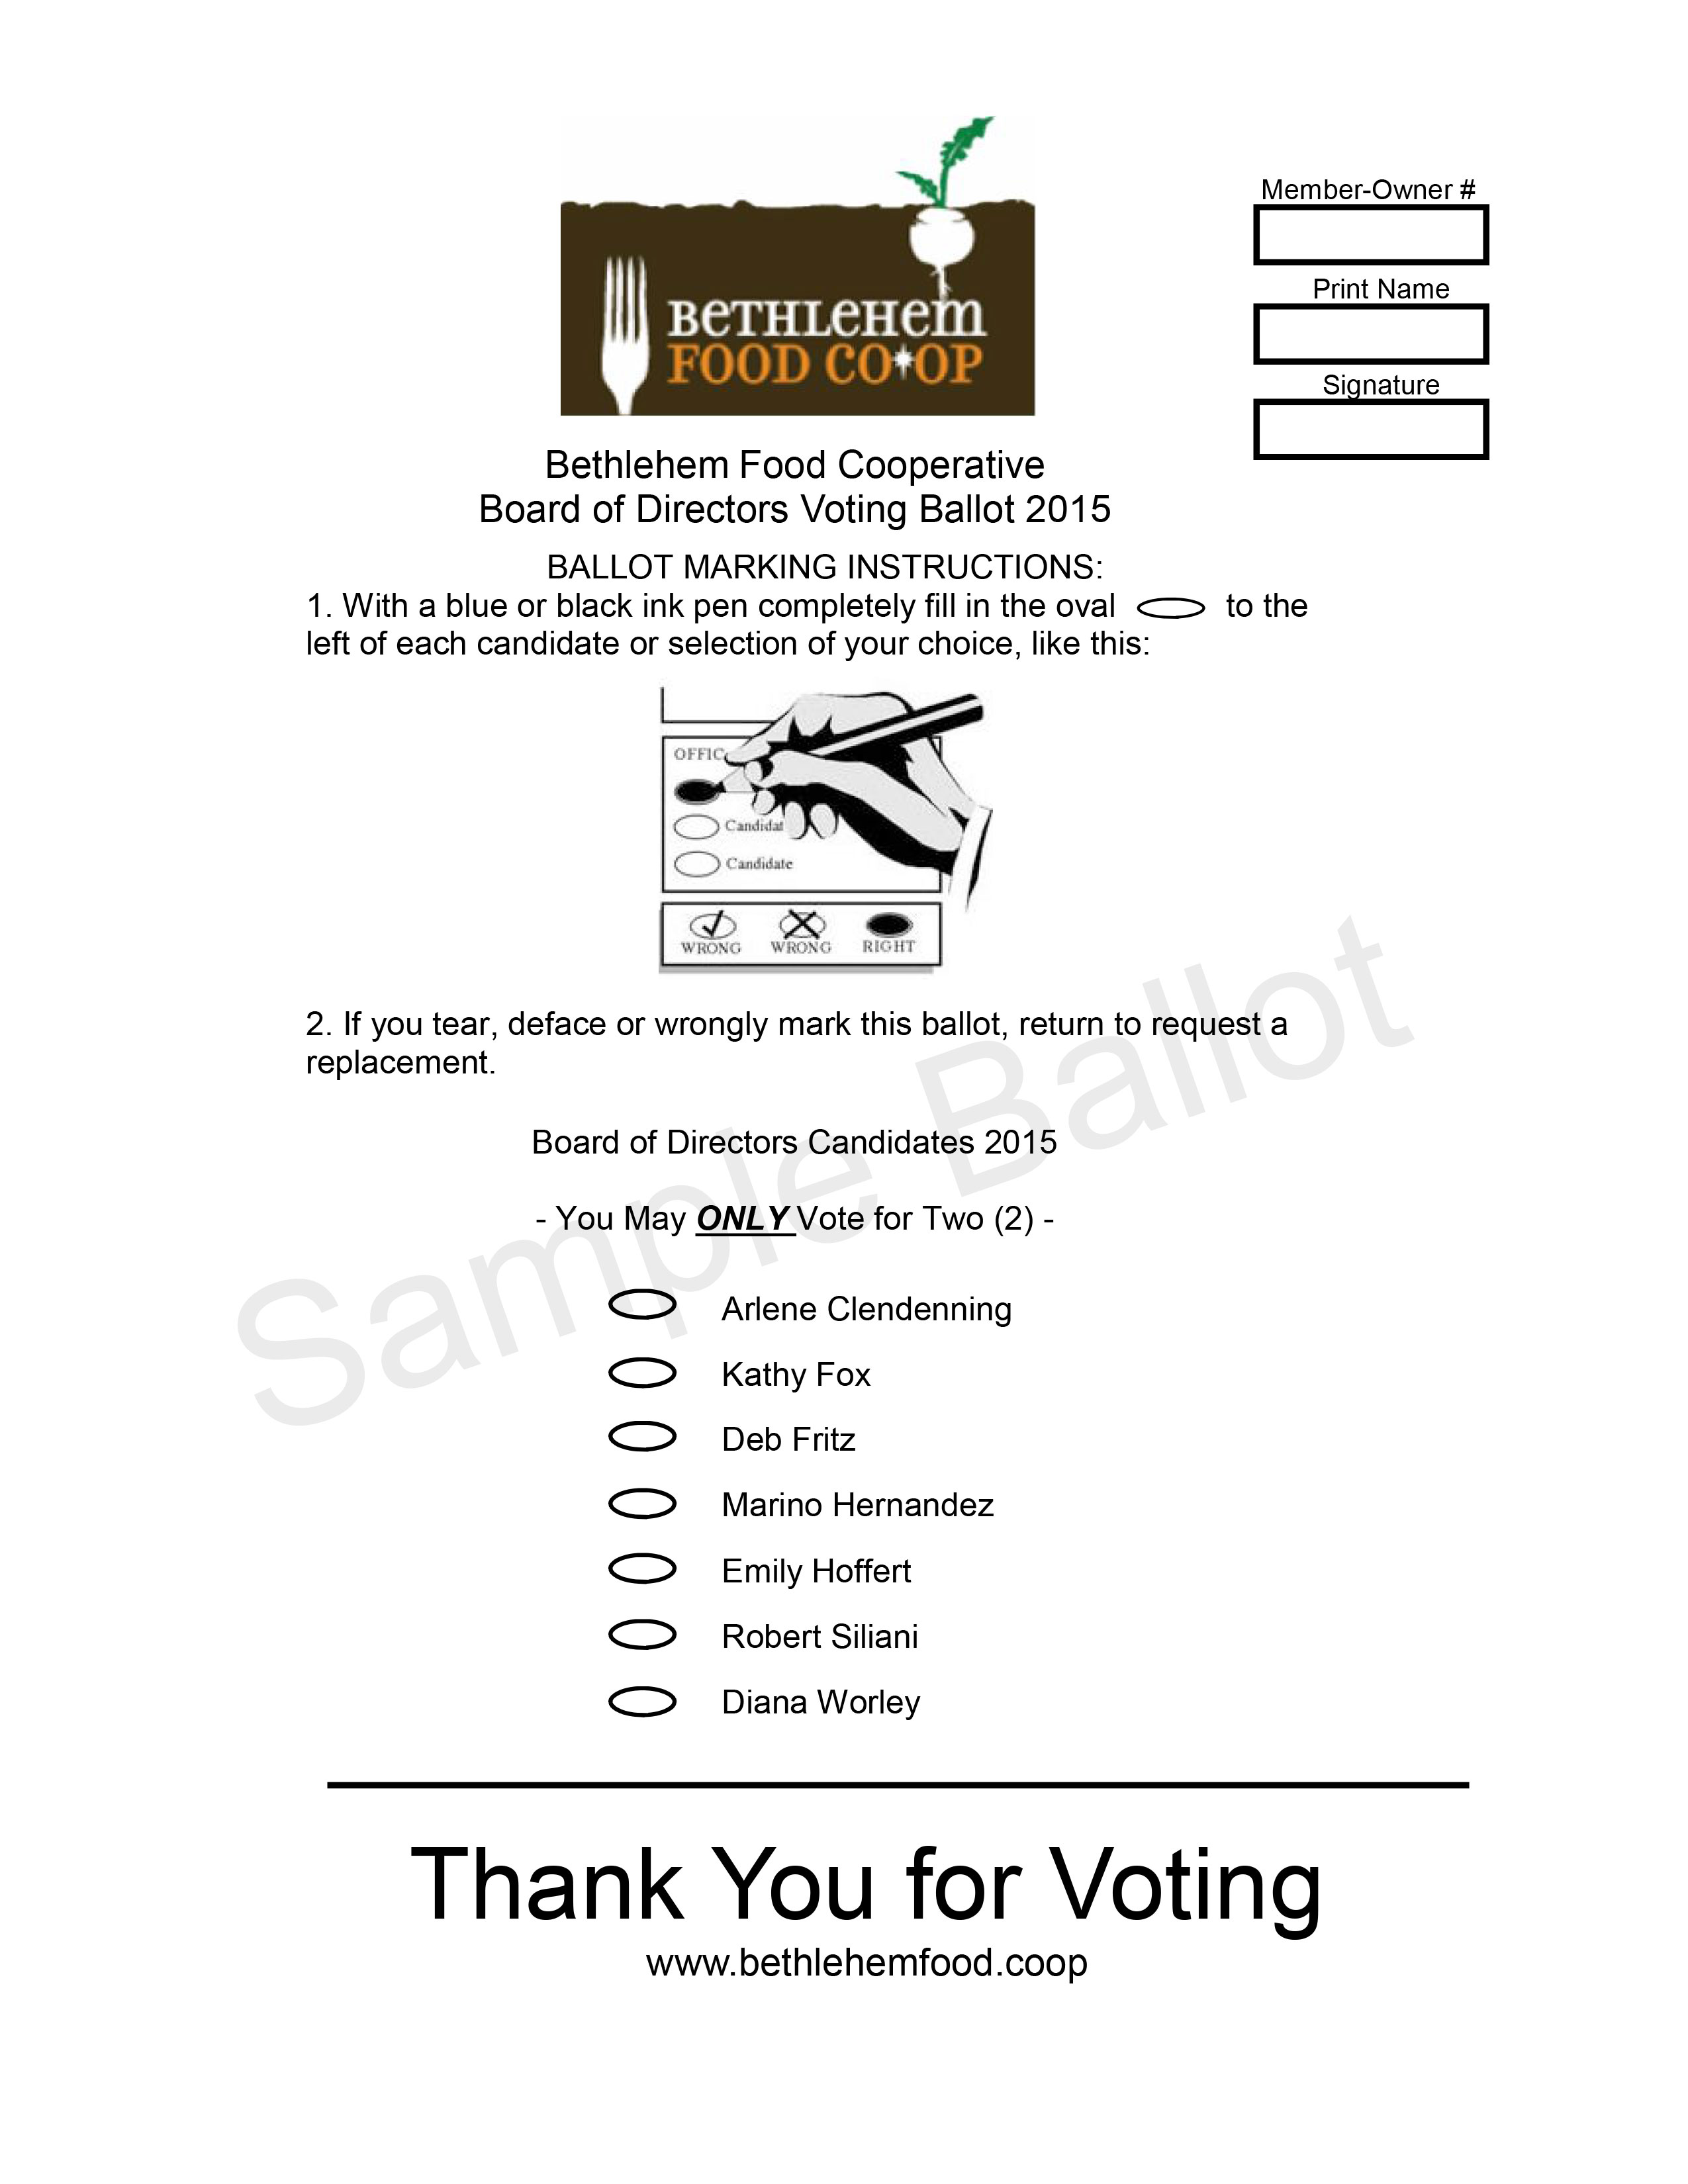 2015 BFC Voting Ballot